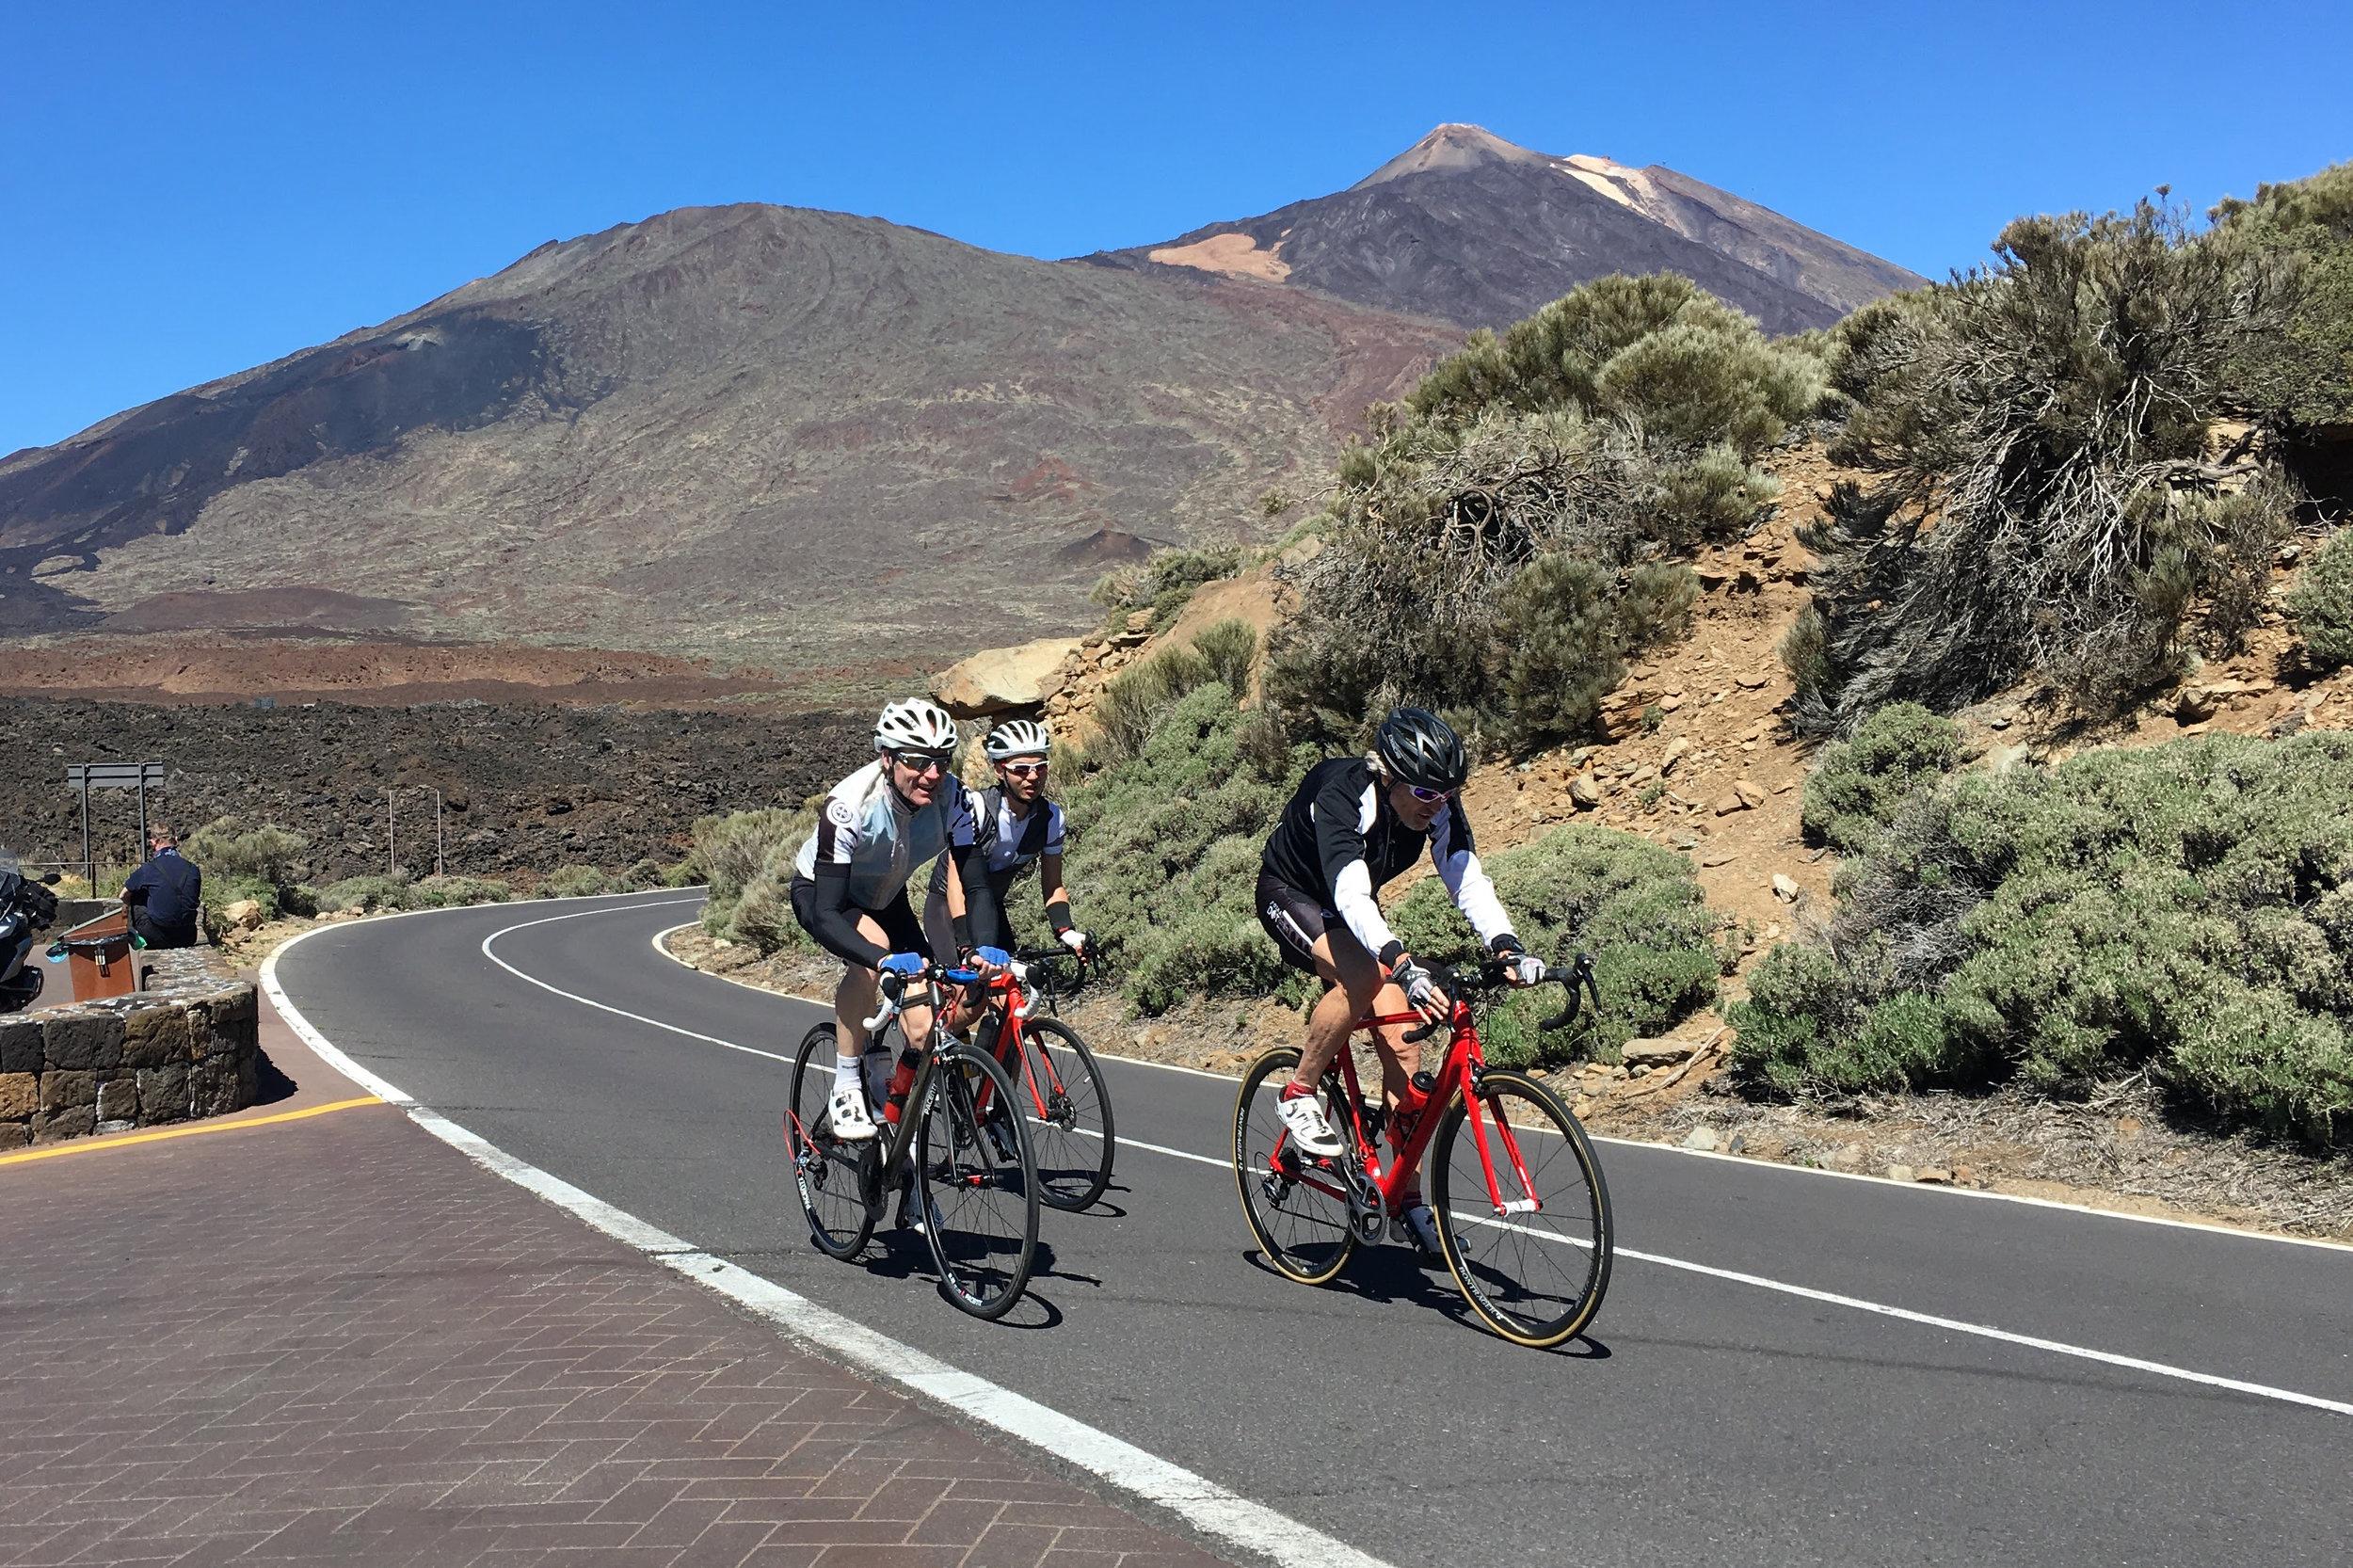 Training on roads in Tenerife